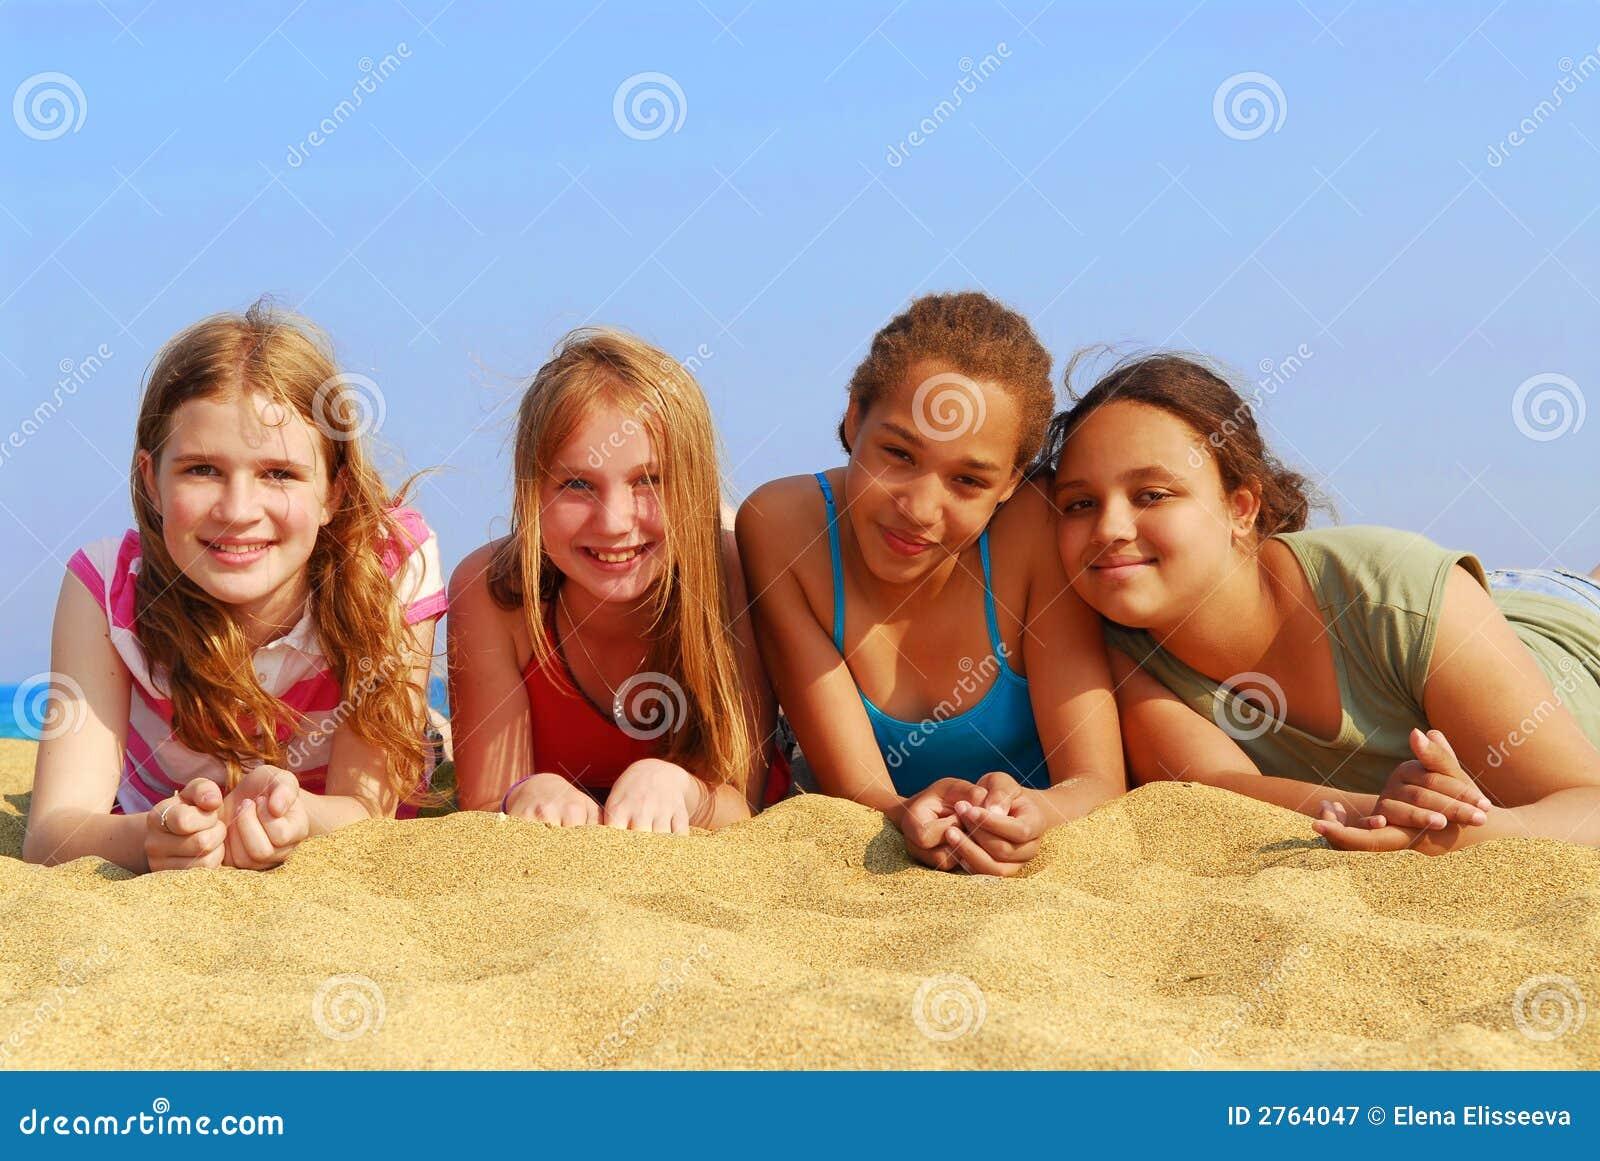 Телки на пляже групповуха — photo 1